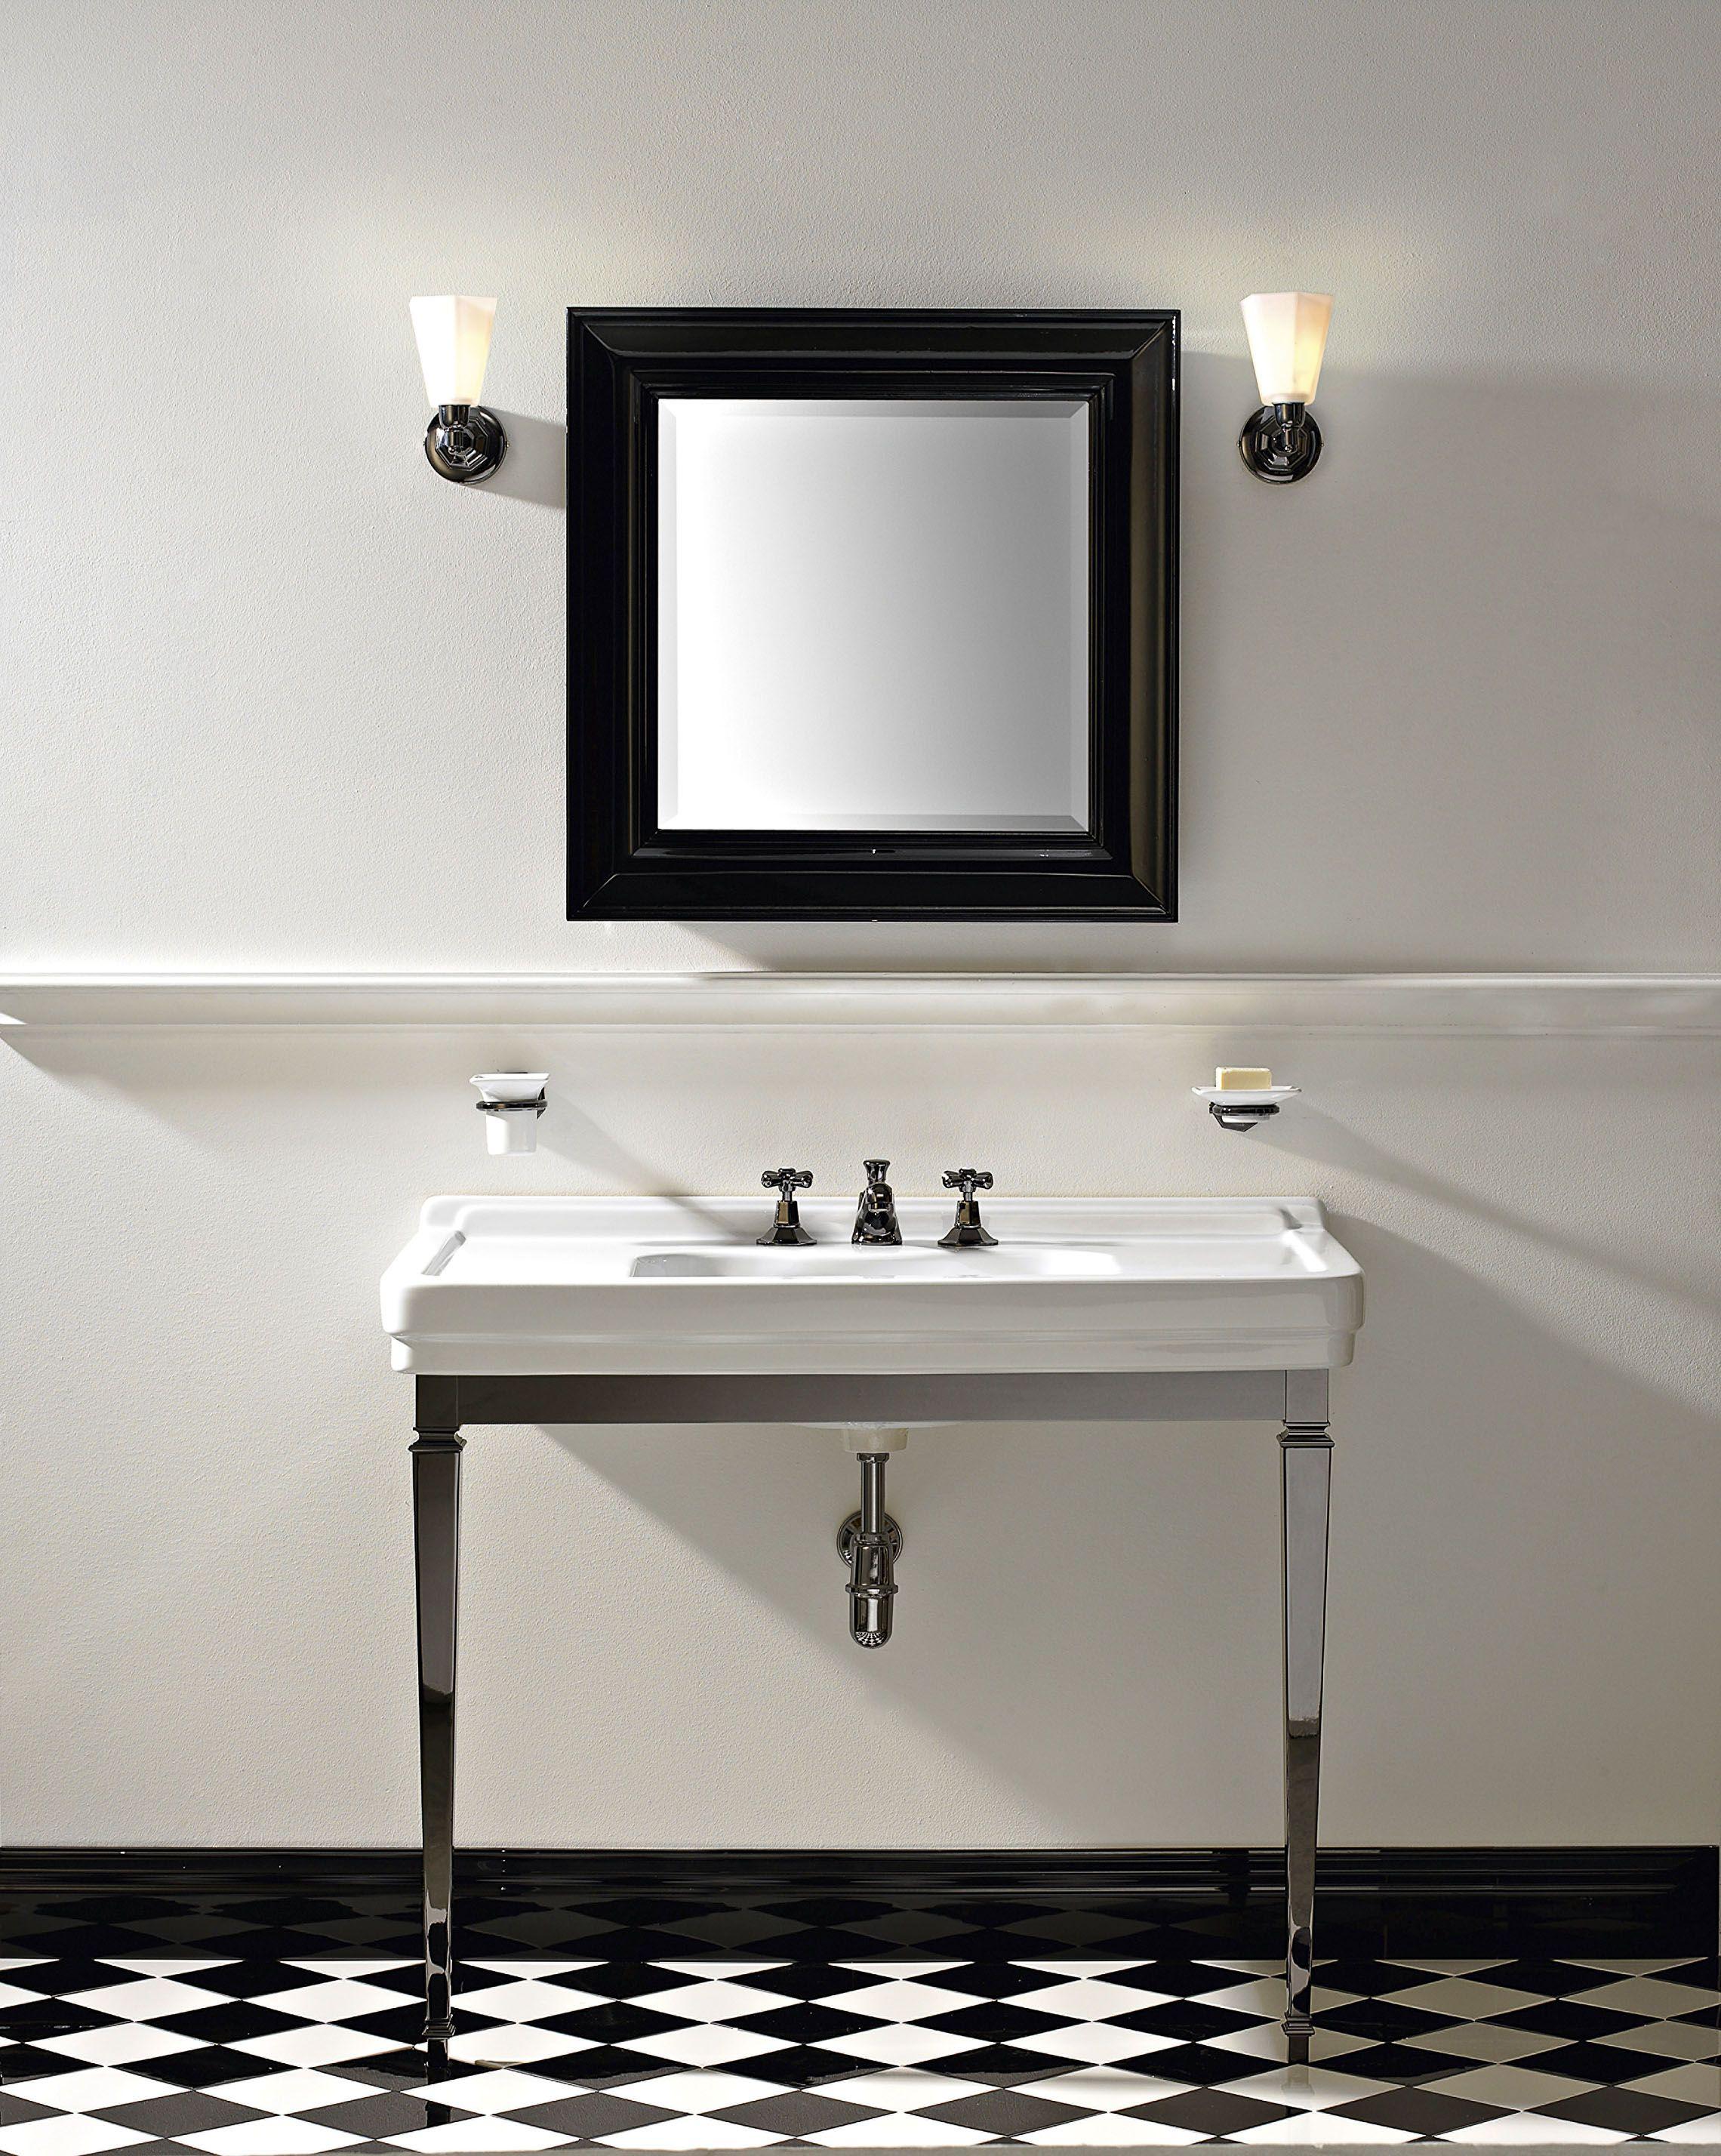 bathroom accessories manufacturers - Bathroom Accessories Manufacturers